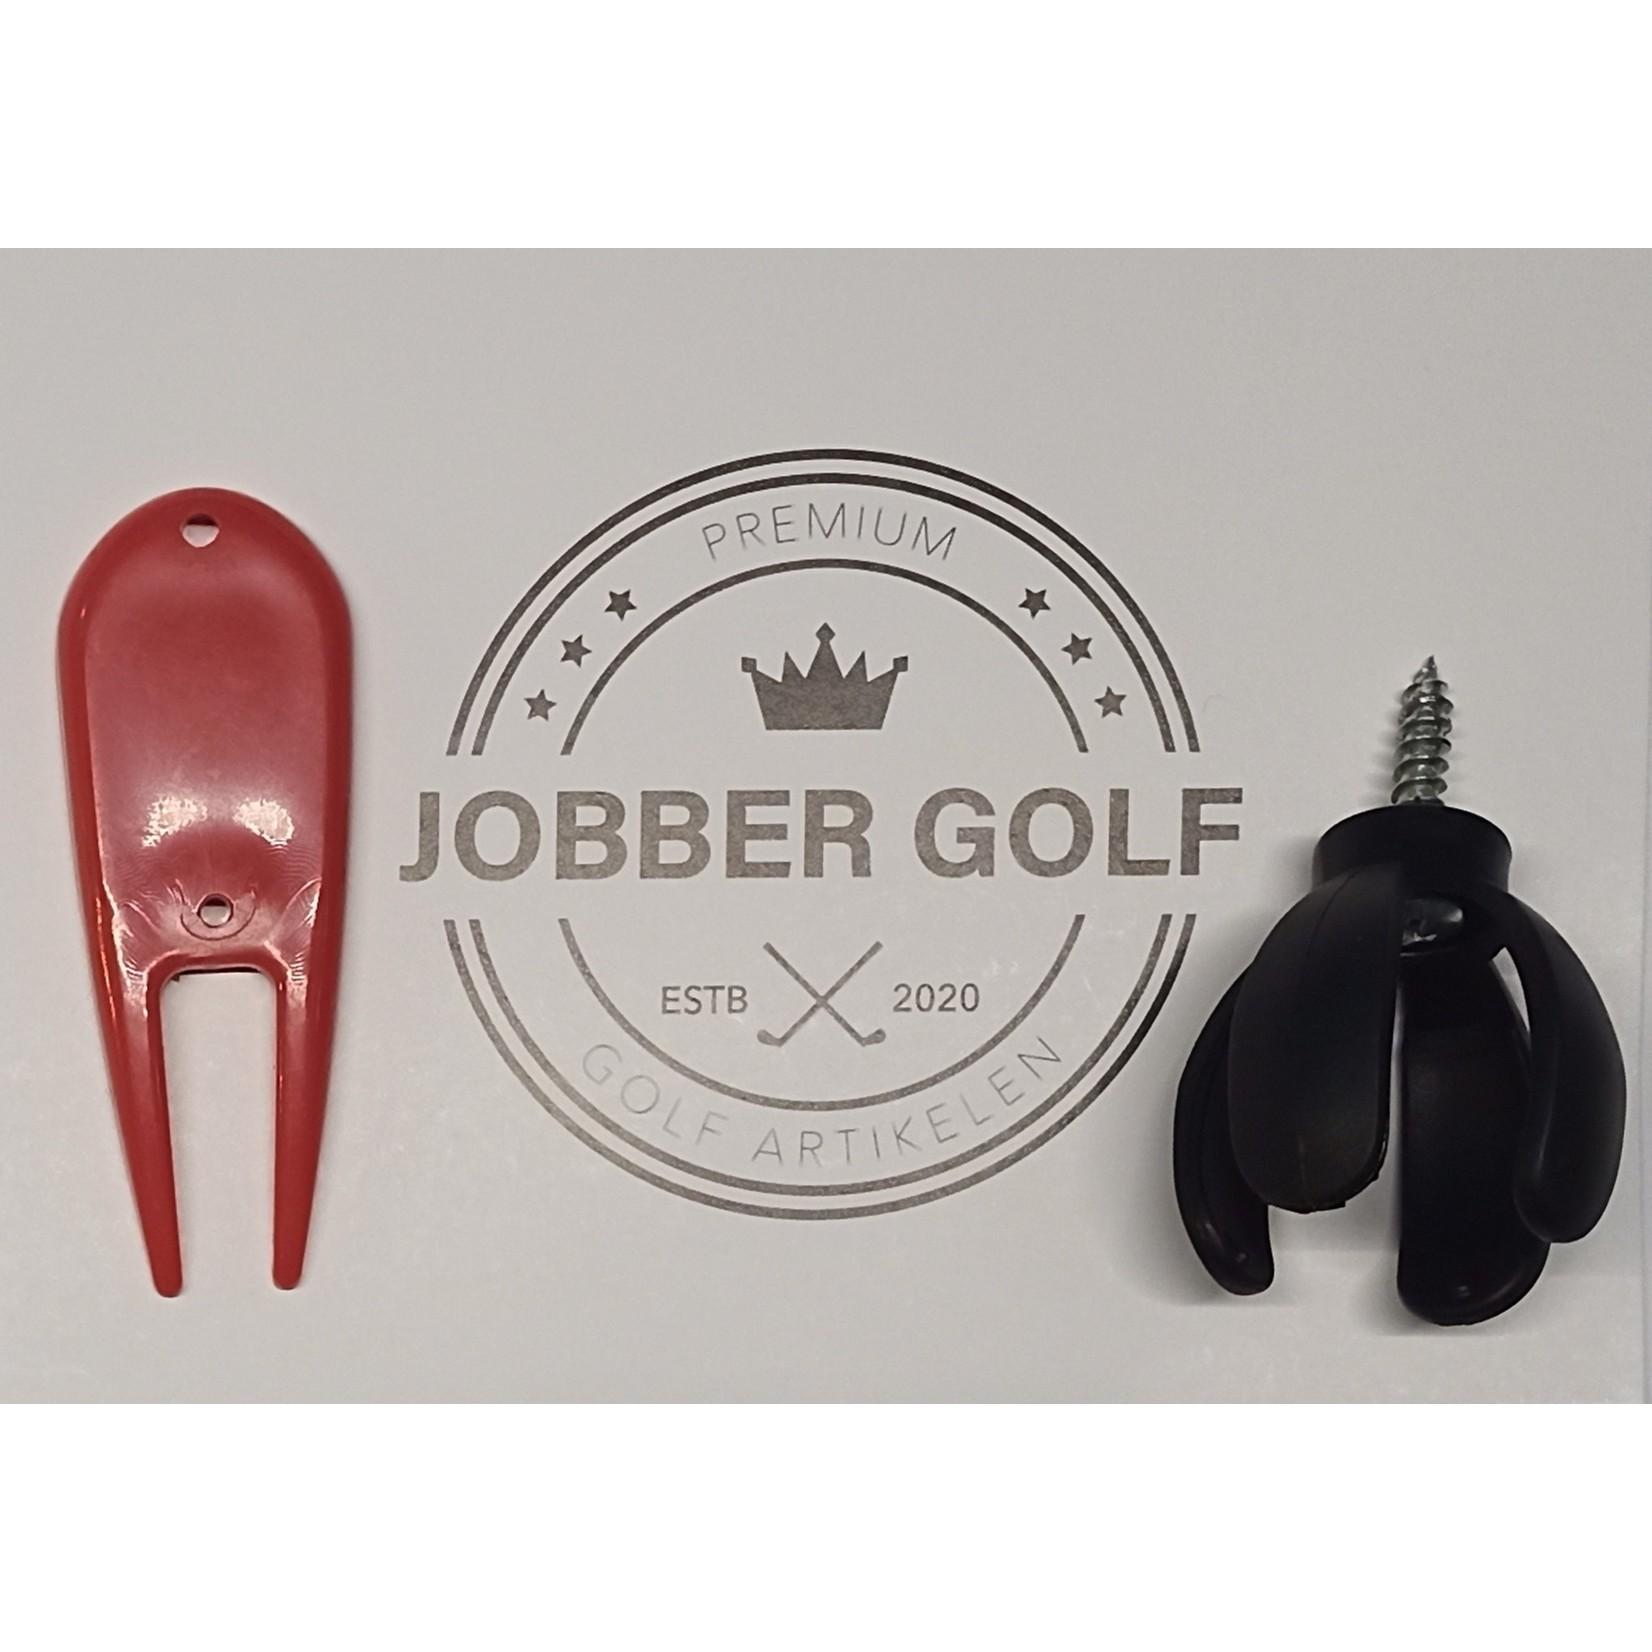 Jobber Golf Jobber Golf – Ballenklem / Golfballenraper + gratis pitchfork